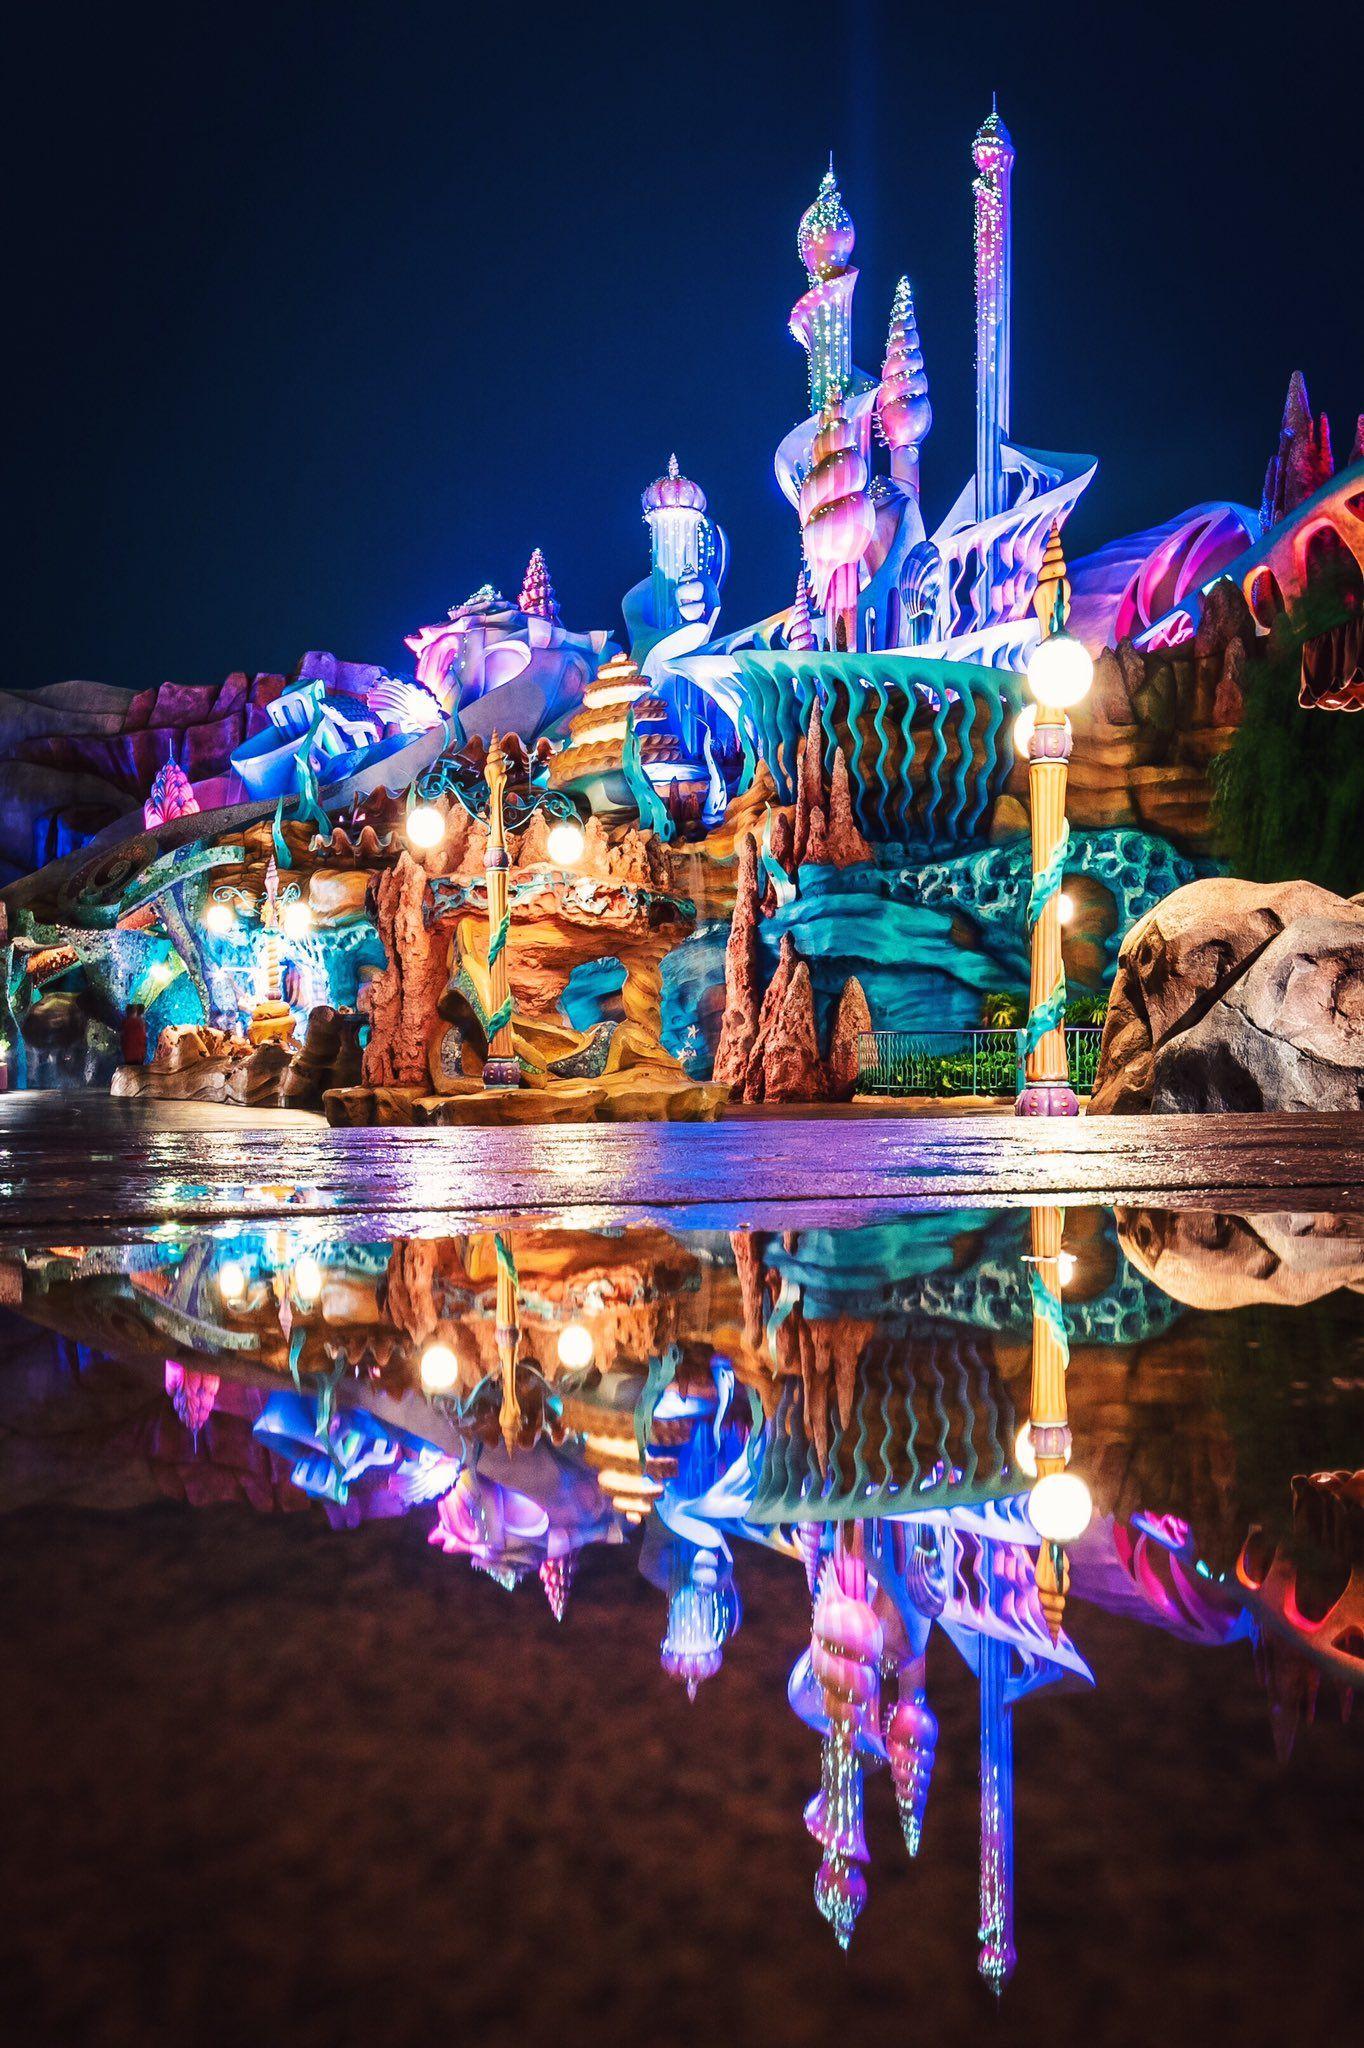 Amachan On Twitter In 2021 Disney Wallpaper Disney Aesthetic Disney Ducktales